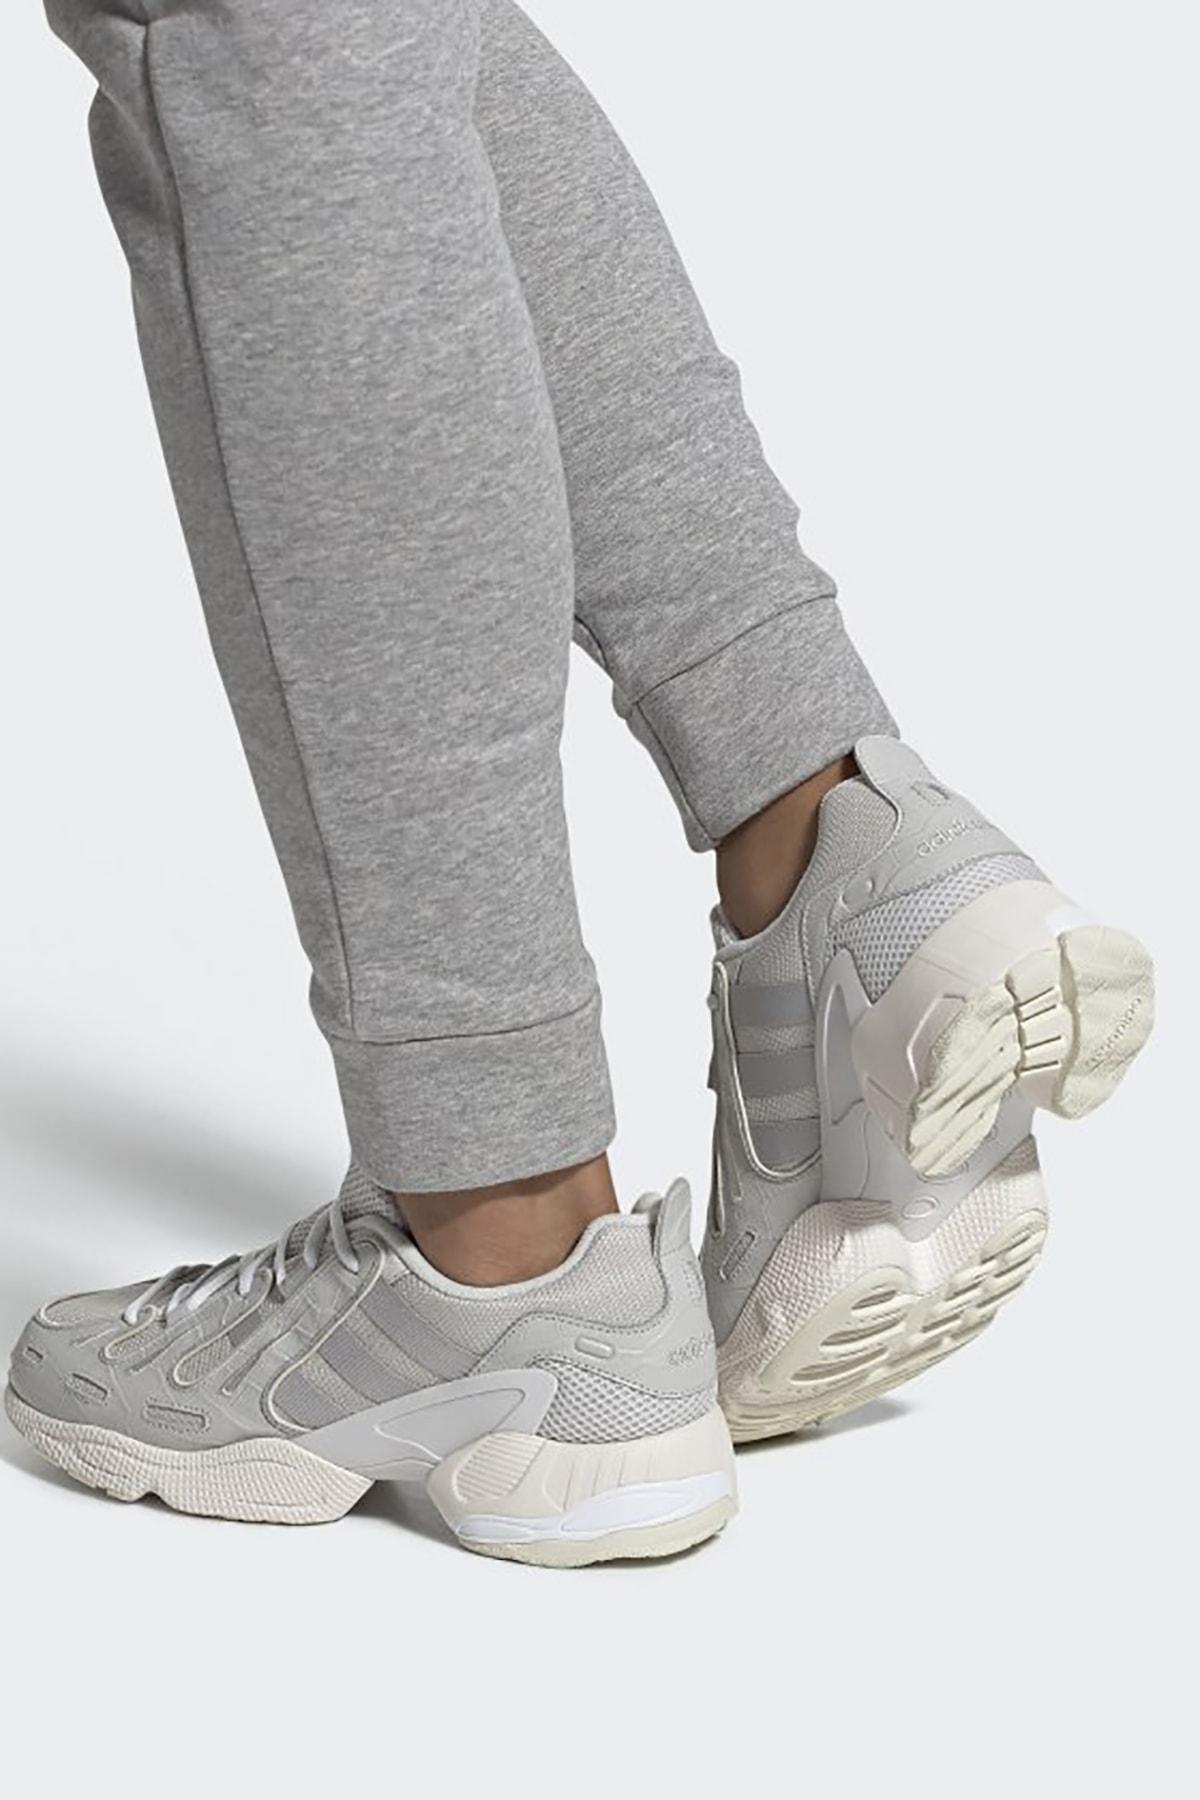 adidas Erkek Spor Ayakkabı - Eqt Gazelle 2